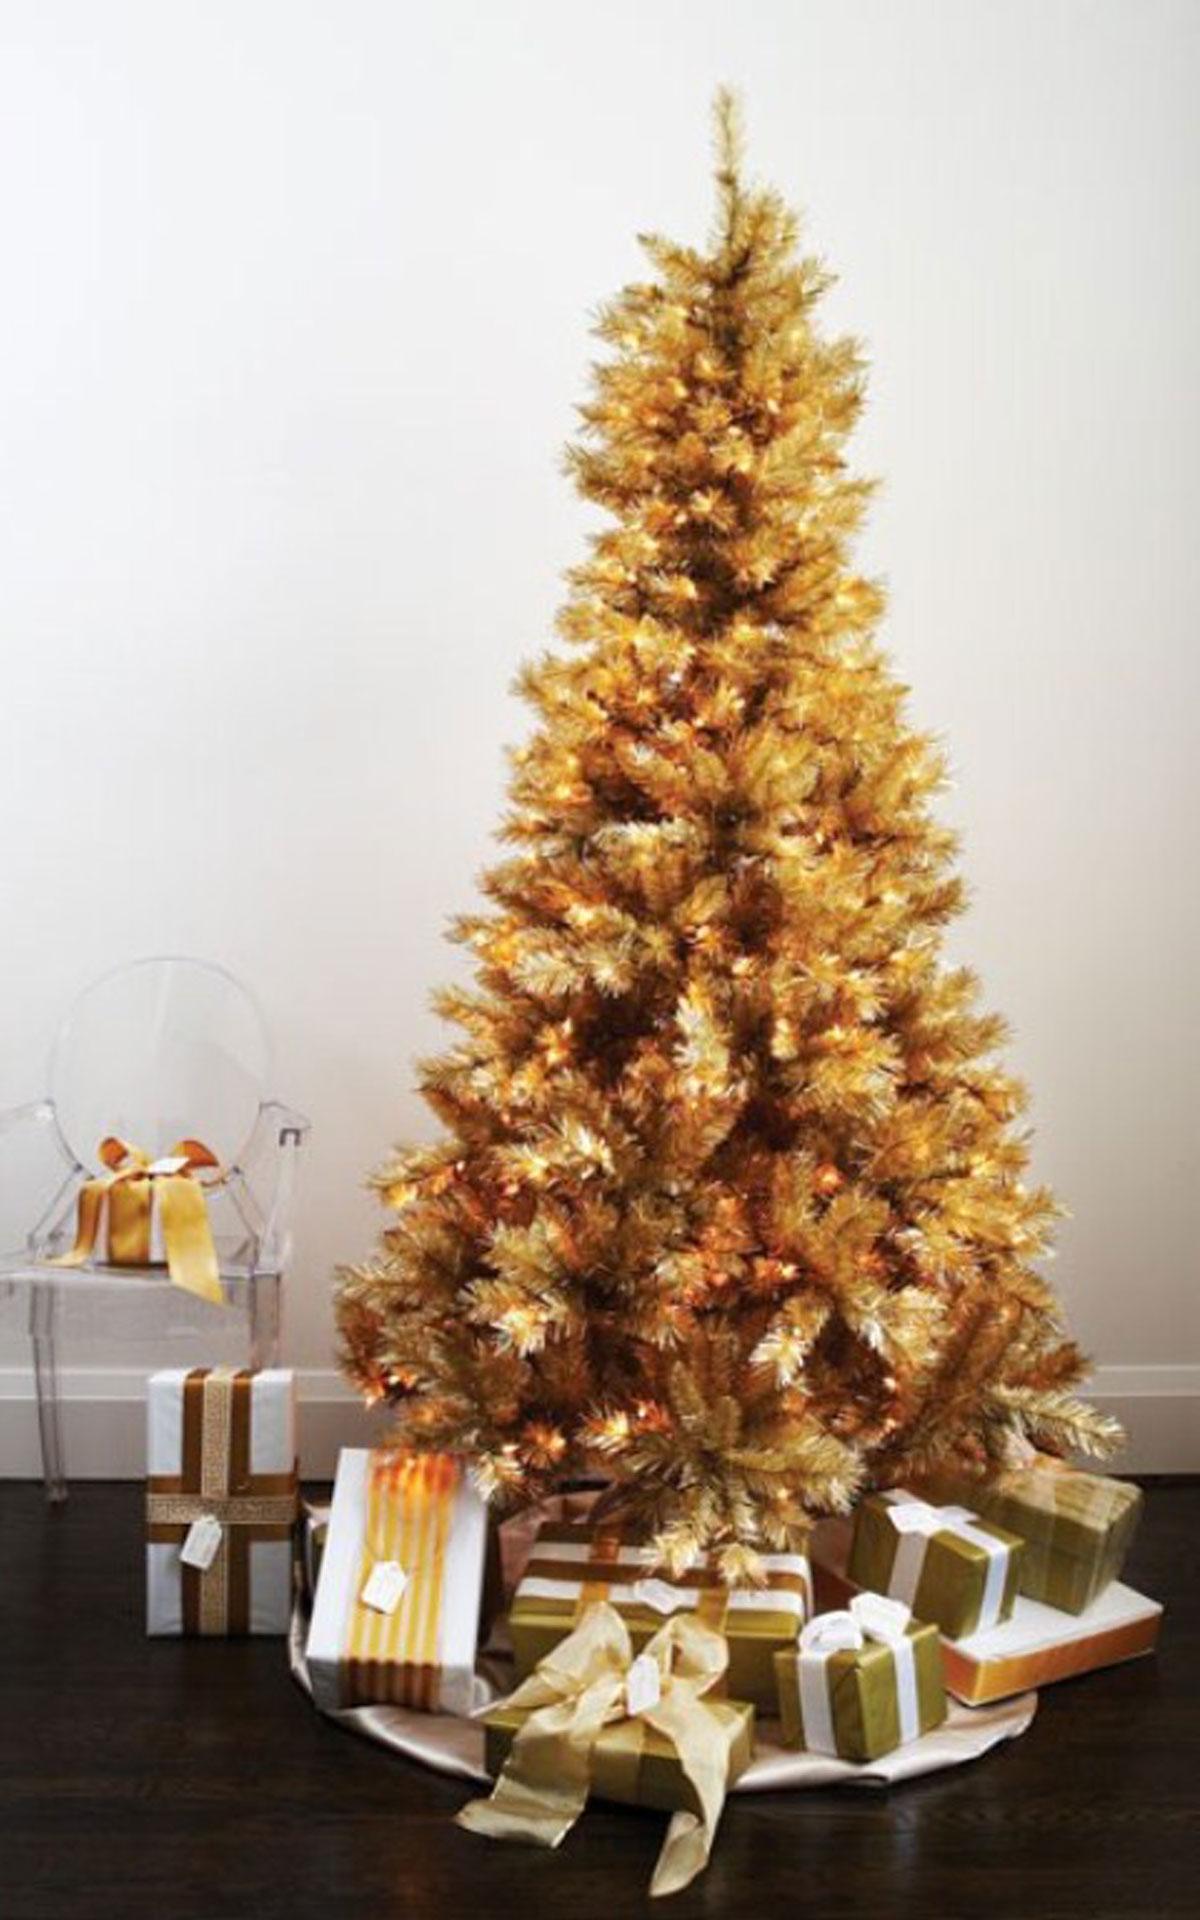 Luxury-Golden-Christmas-tree-decorations-ideas